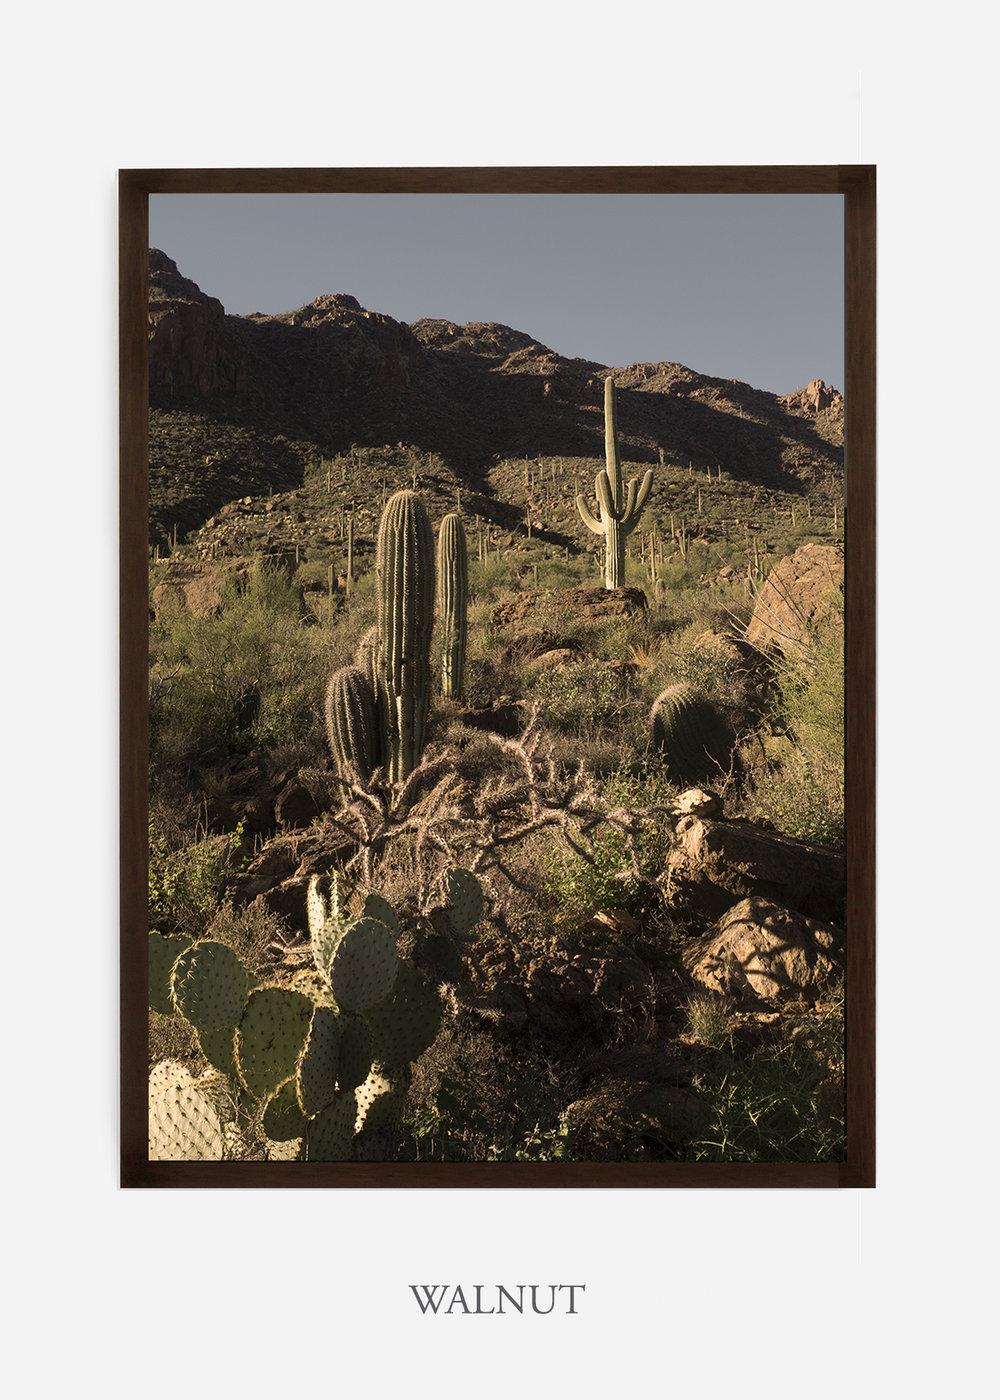 nomat-walnutframe-saguaroNo.18-wildercalifornia-art-wallart-cactusprint-homedecor-prints-arizona-botanical-artwork-interiordesign.jpg